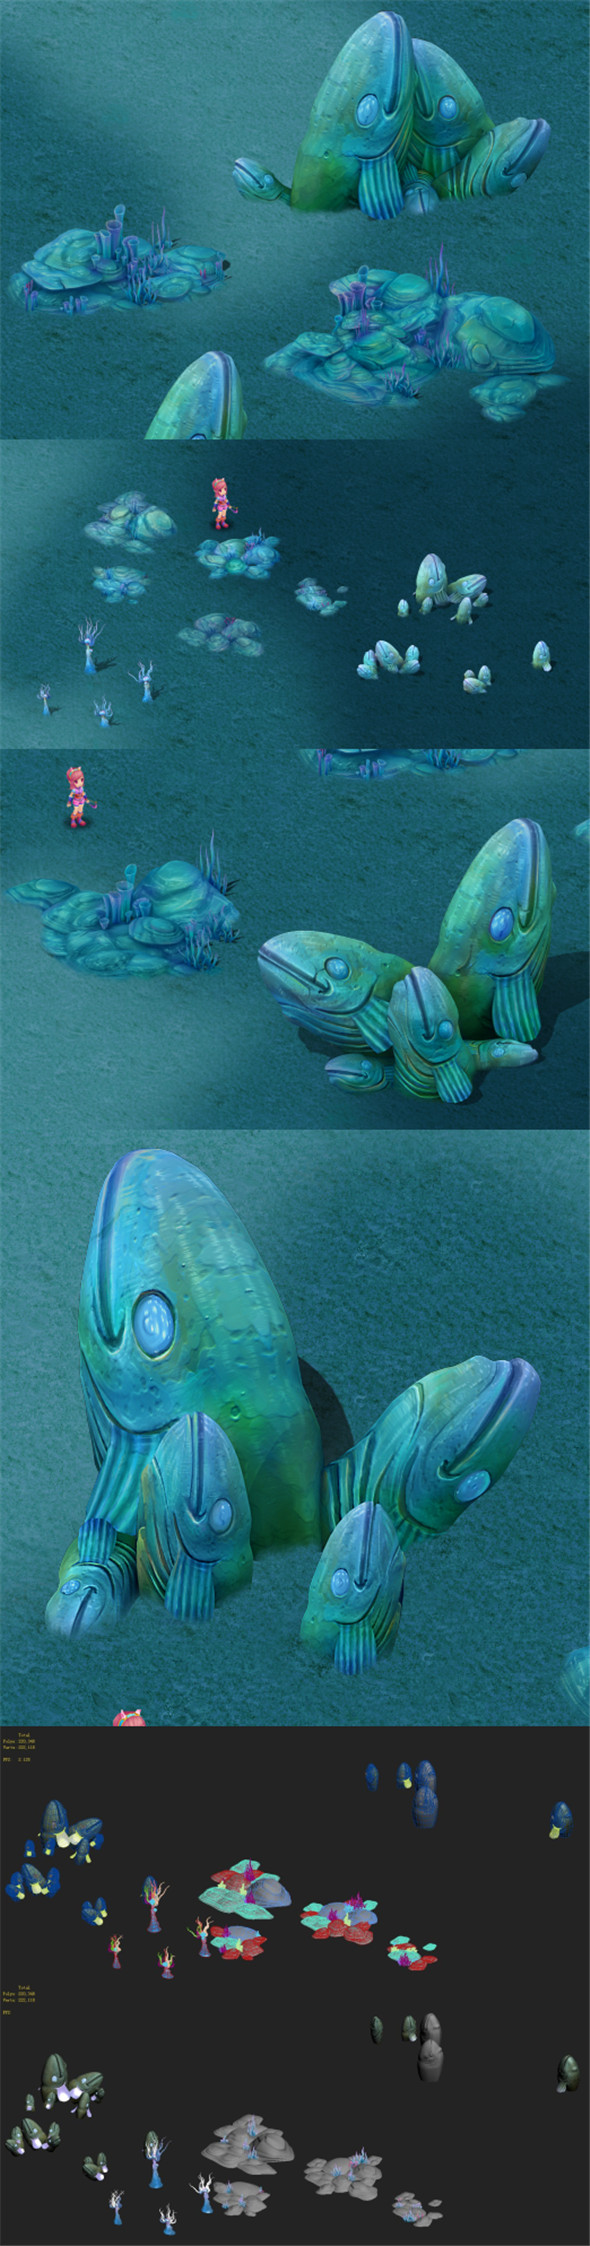 Submarine Cartoon World - Fishman Elegy Surface - 3DOcean Item for Sale